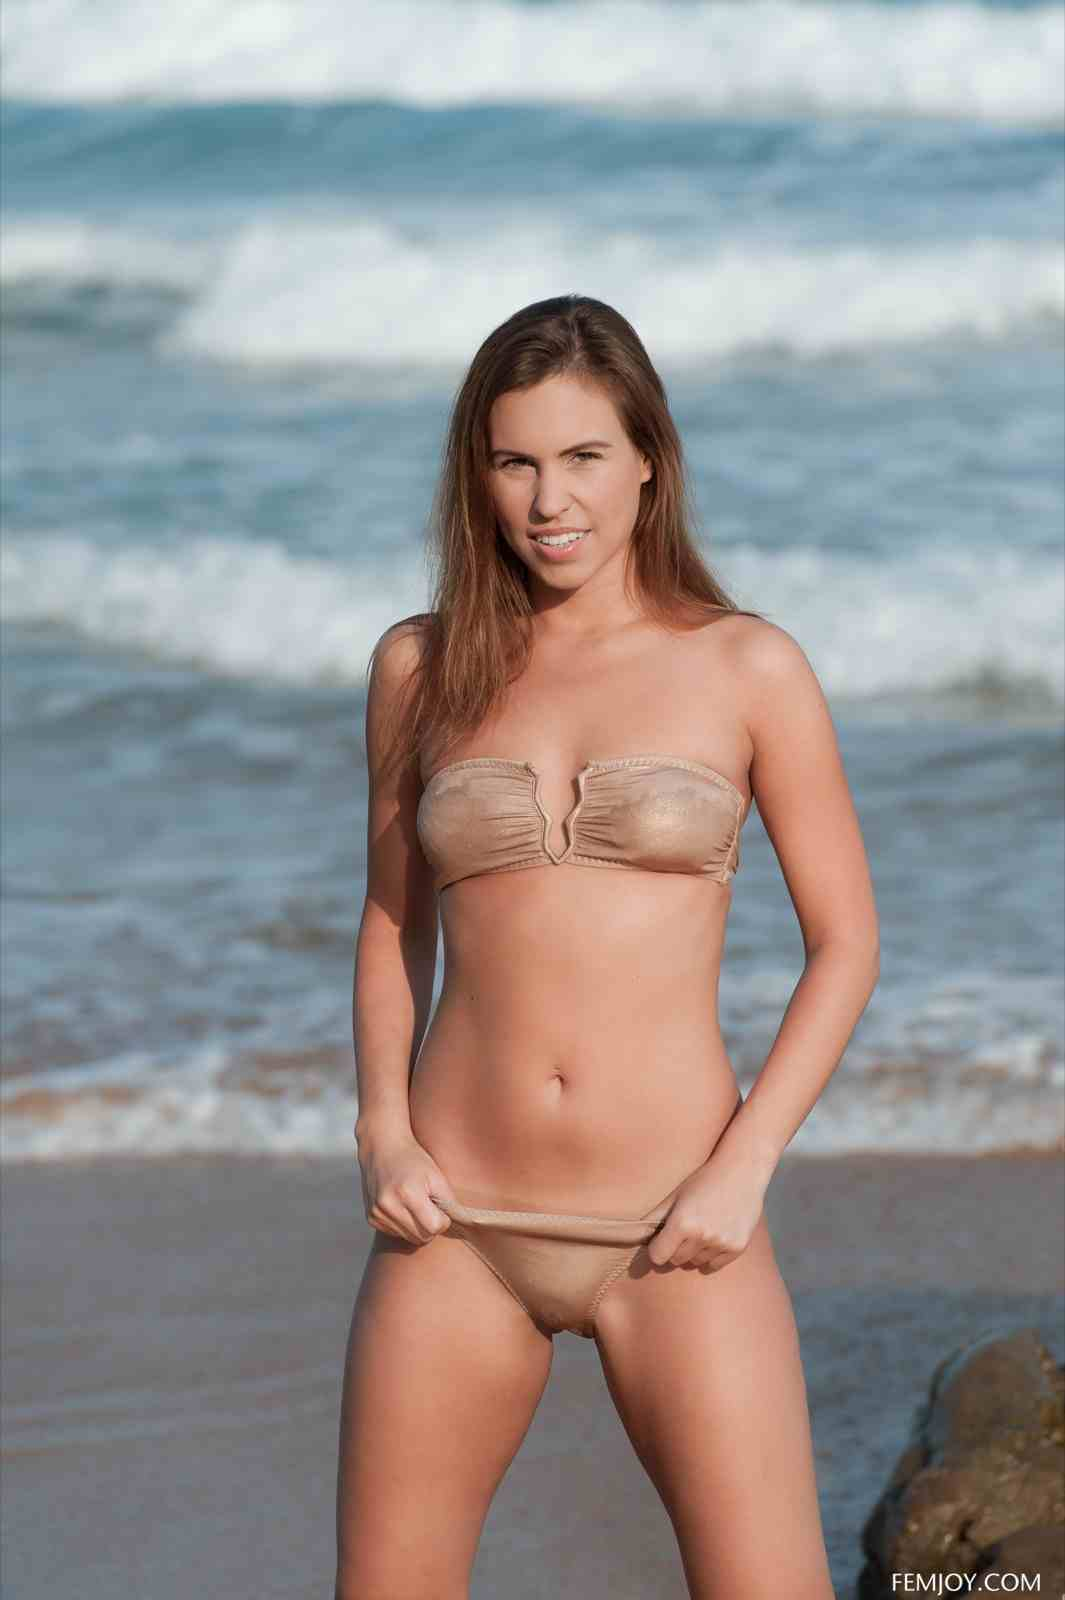 Susana jumong sex xxx - Jomong sex jomong sex jenny hendrix videos large  porn tube free